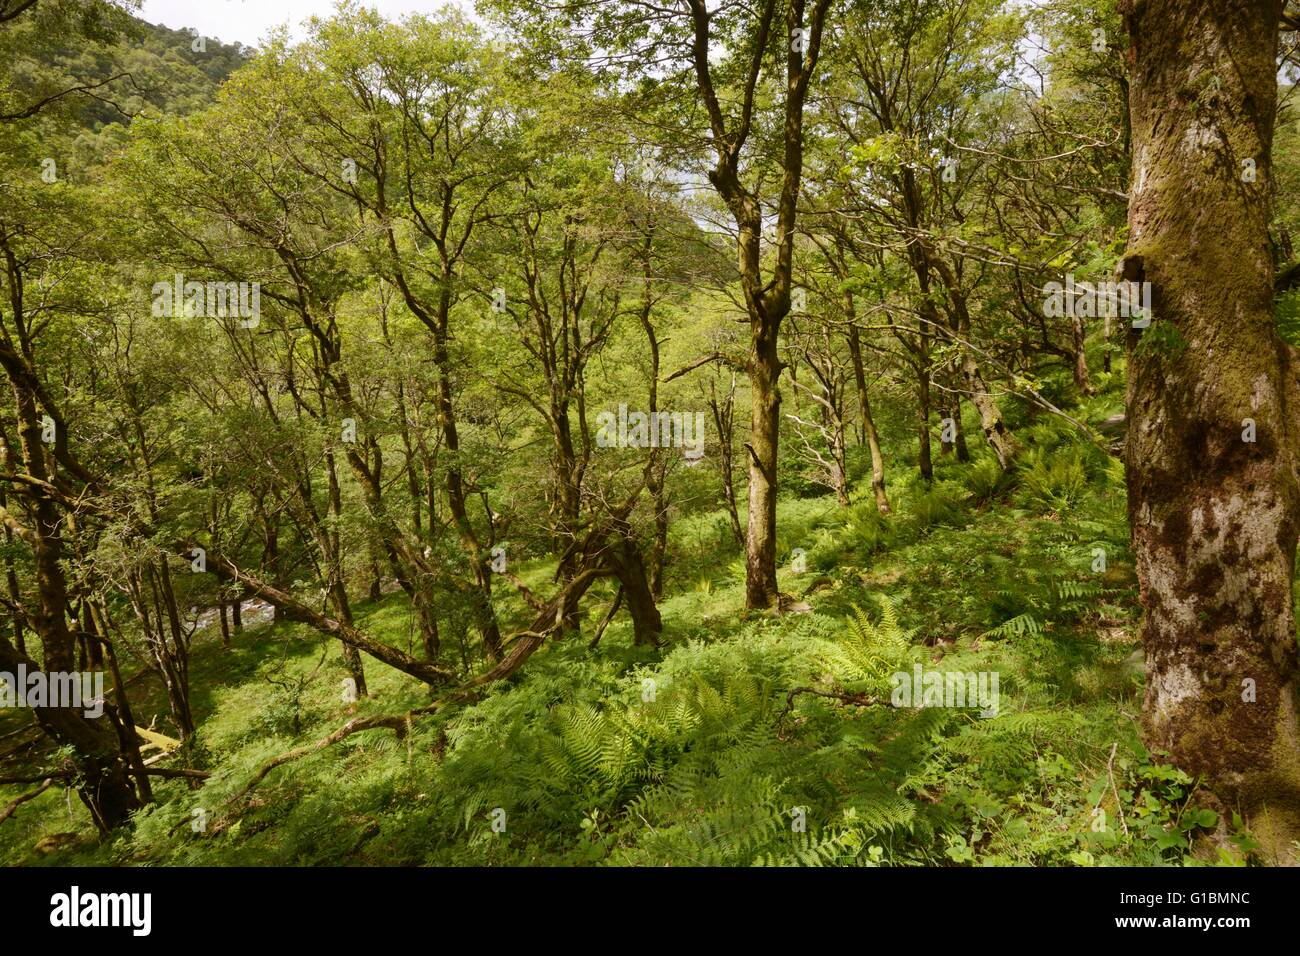 Mature Sessile Oak woodland at Dinas RSPB reserve Wales, UK - Stock Image